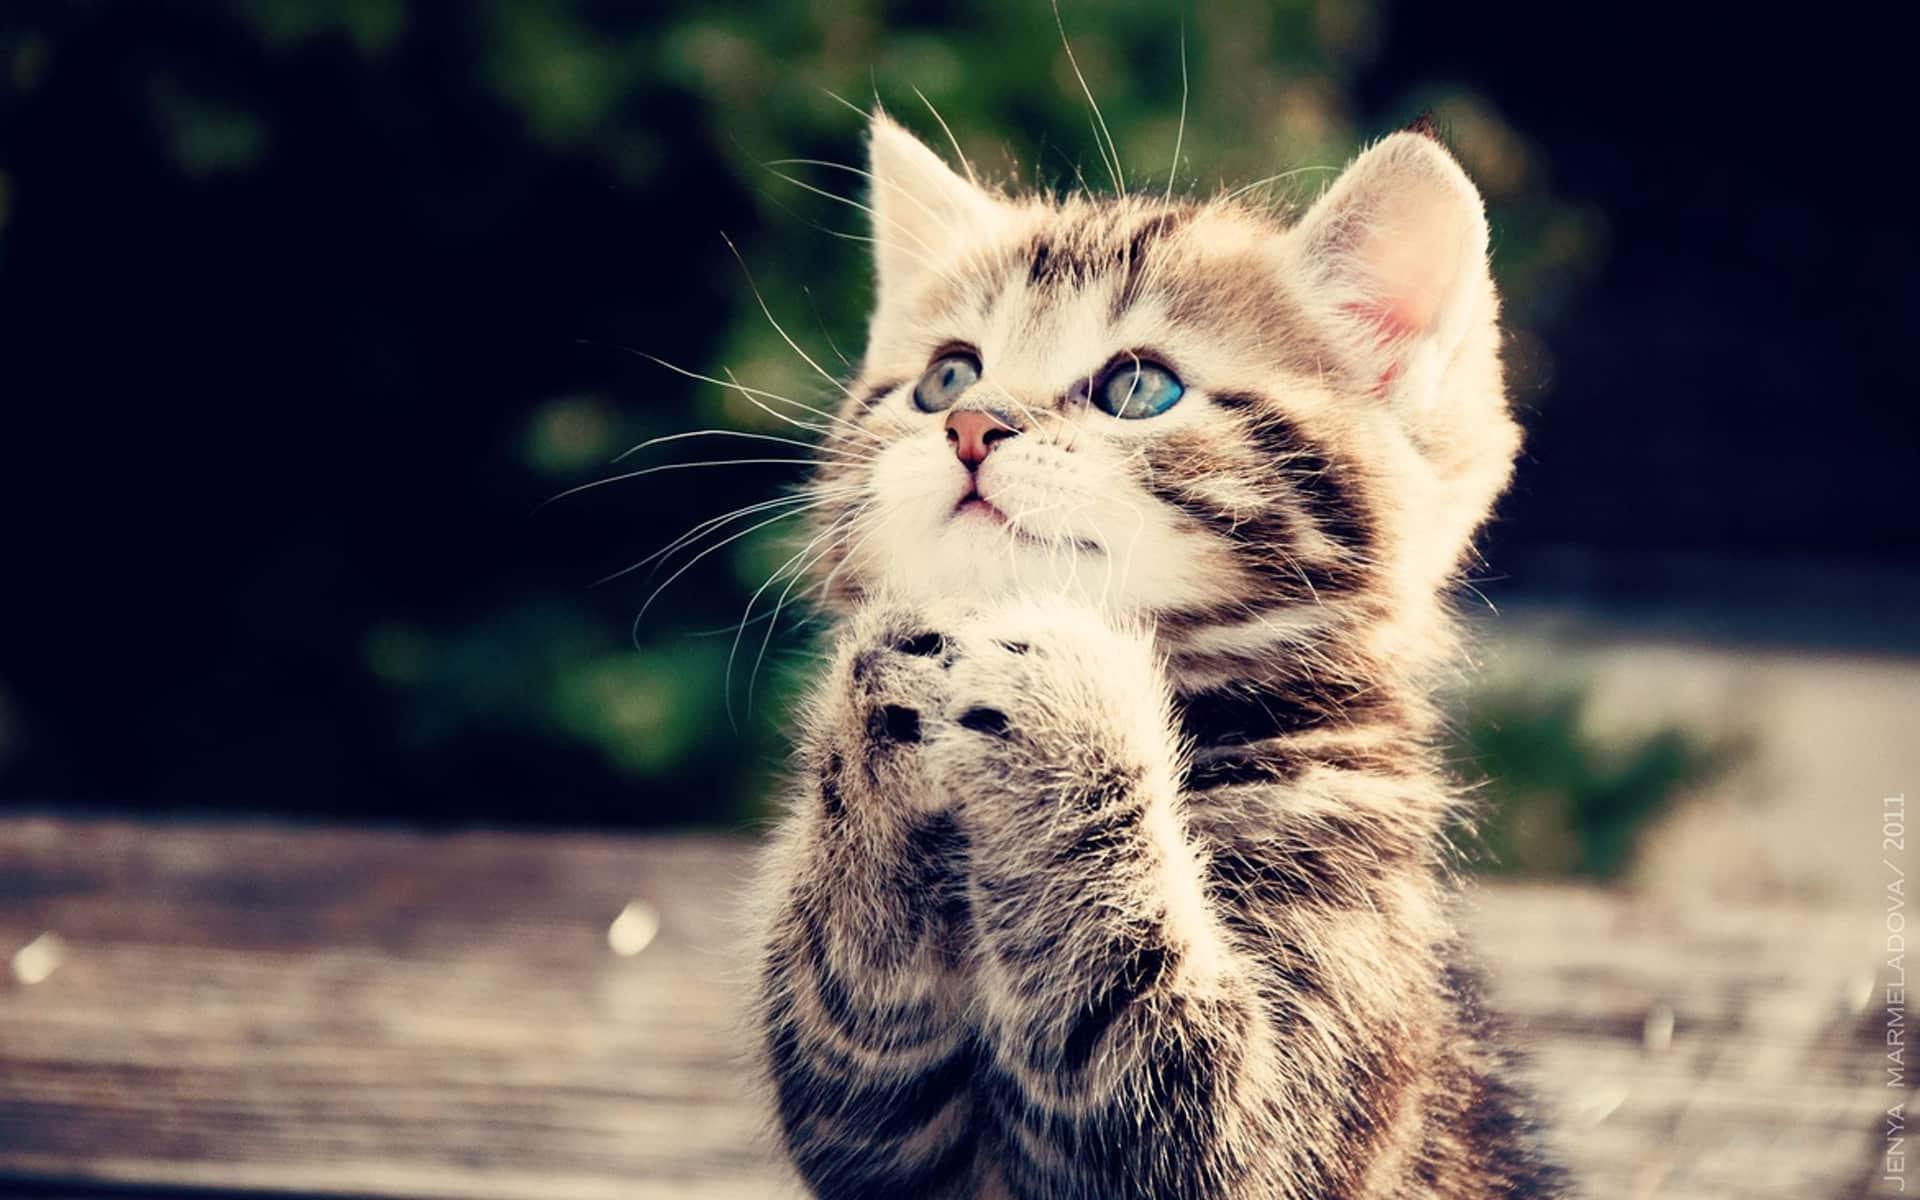 Fonds d'écran de chat gratuits • MonChat.ca